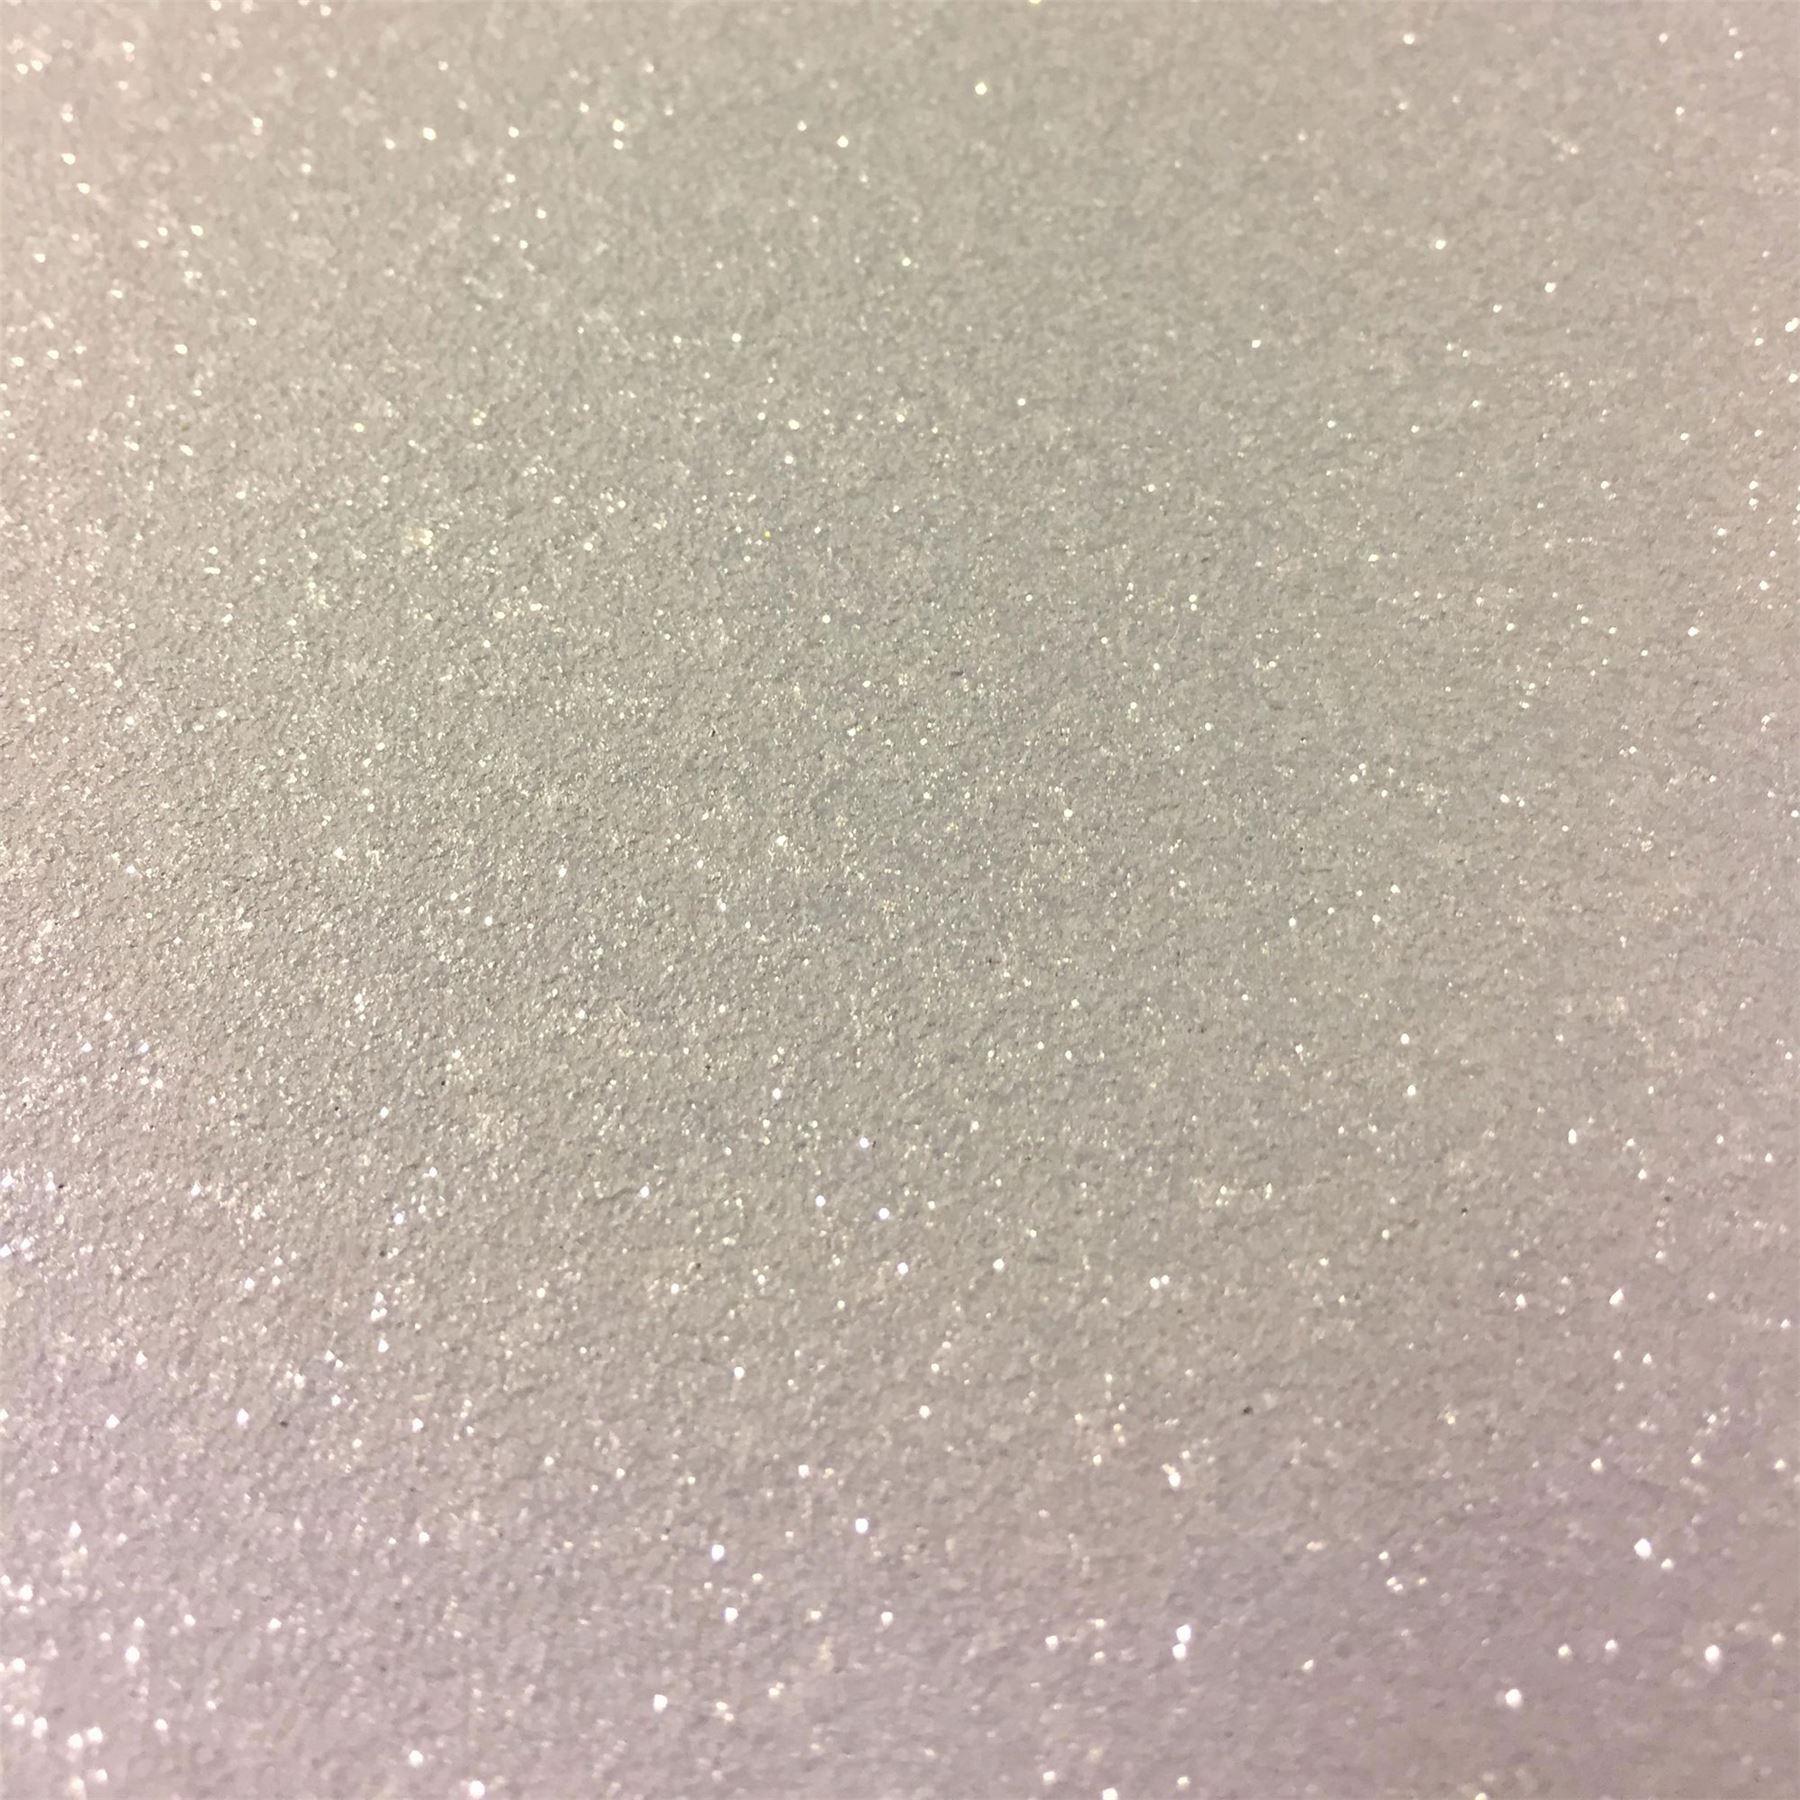 Details About Grey Glitter Wallpaper Sparkle Shimmer Shiny Modern Luxury Decor Vinyl P S